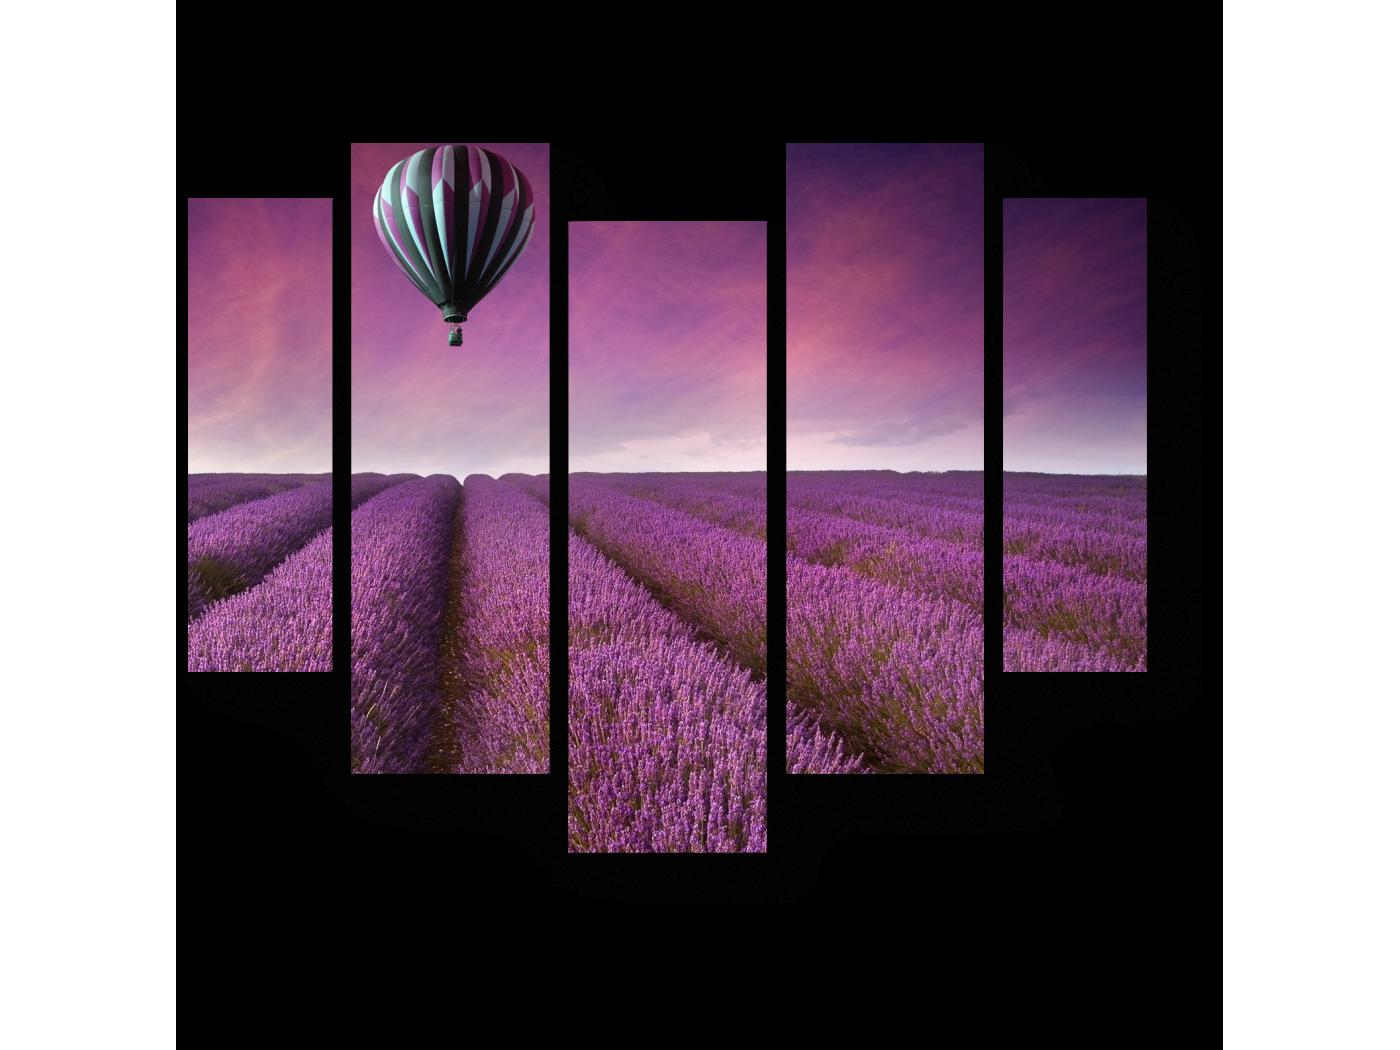 Модульная картина Пролетая над Провансом (101x82) фото